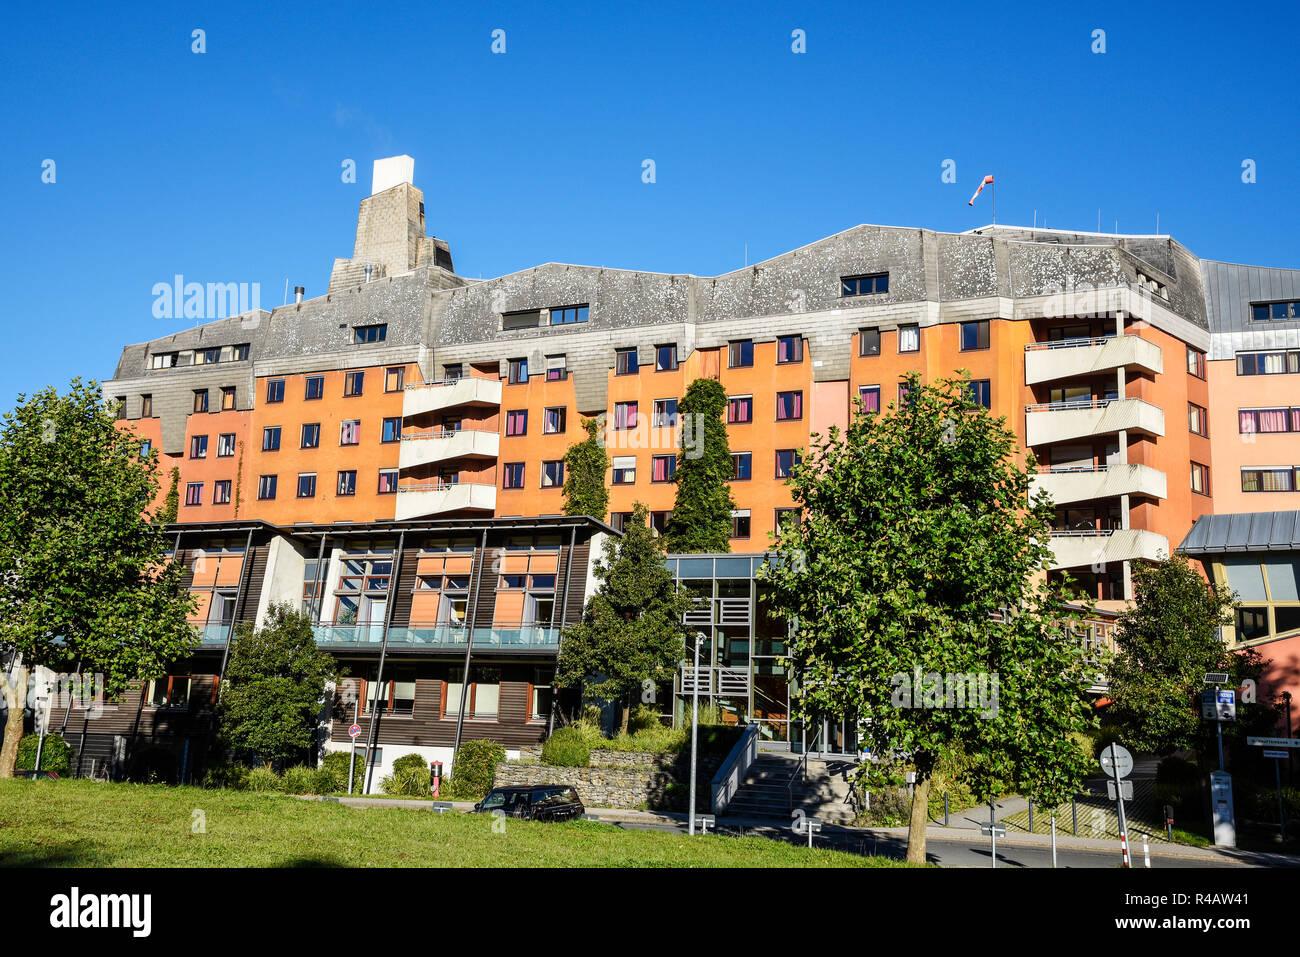 community hospital, anthroposophic hospital, Herdecke, North Rhine-Westphalia, Germany - Stock Image